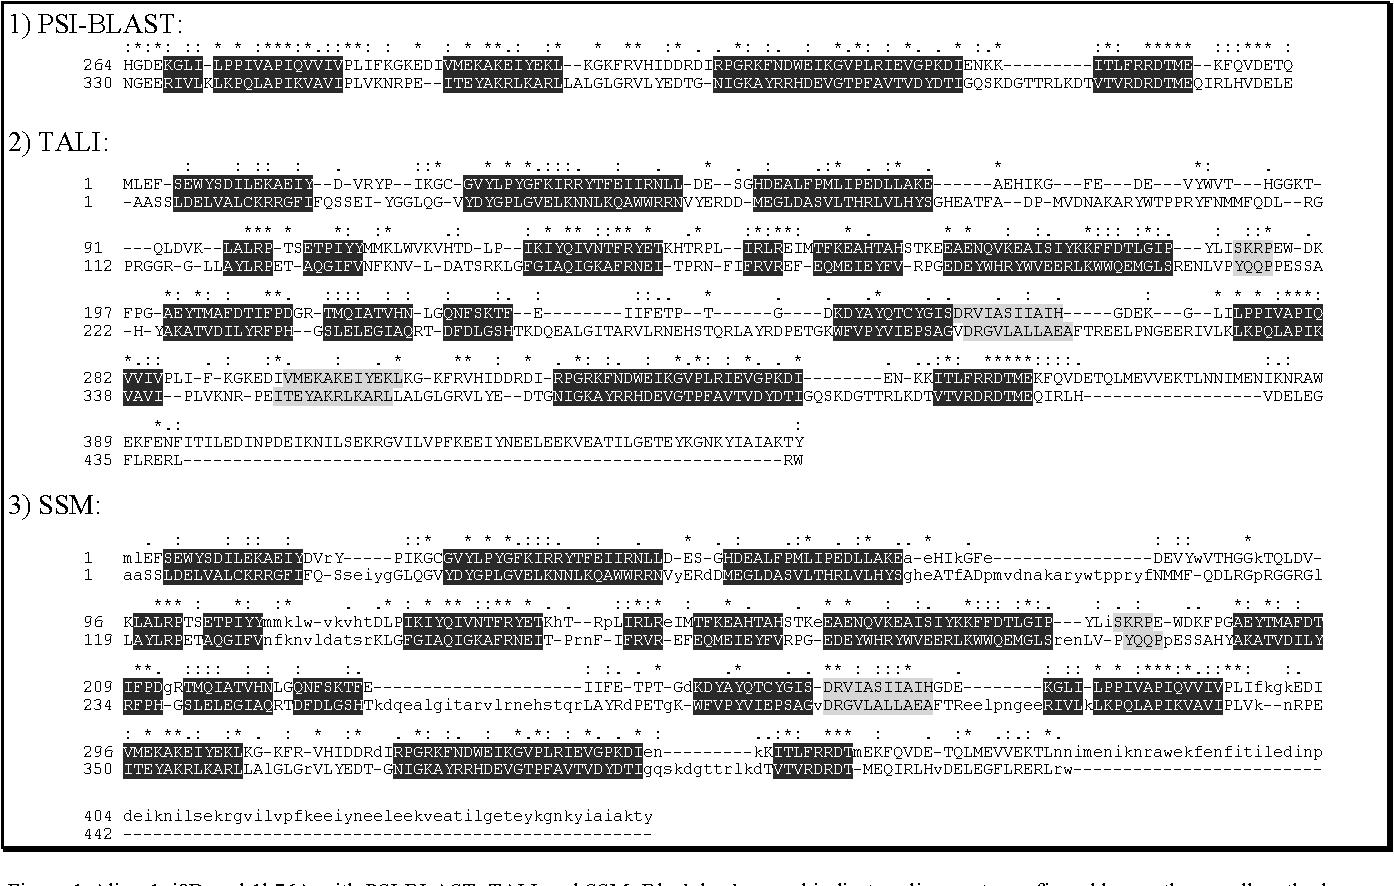 Figure 1 for TALI: Protein Structure Alignment Using Backbone Torsion Angles